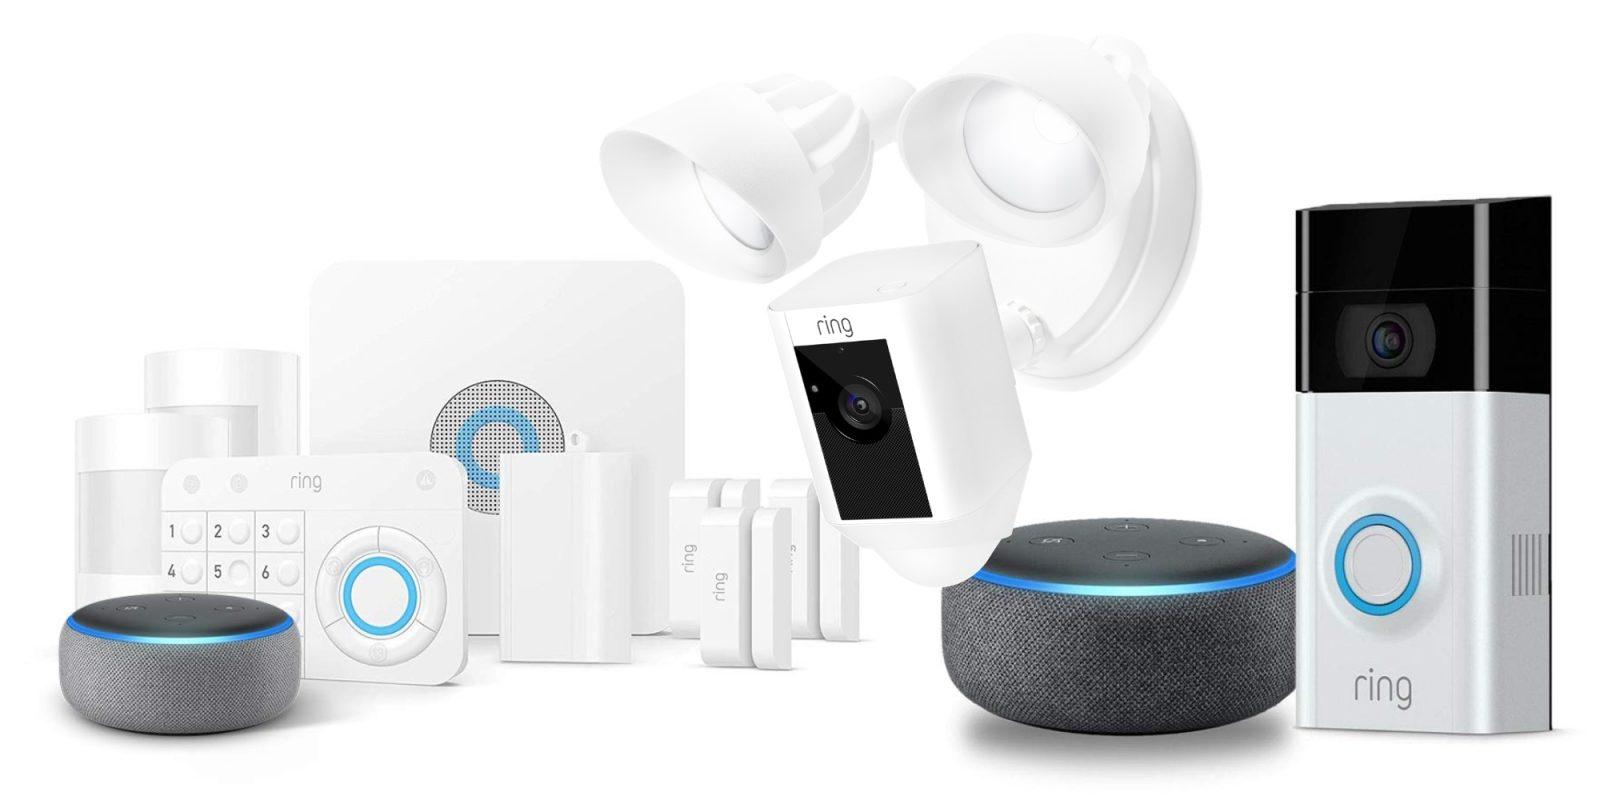 Amazon bundles free Echo Dot w/ discounted Ring Doorbells, Alarm systems, more